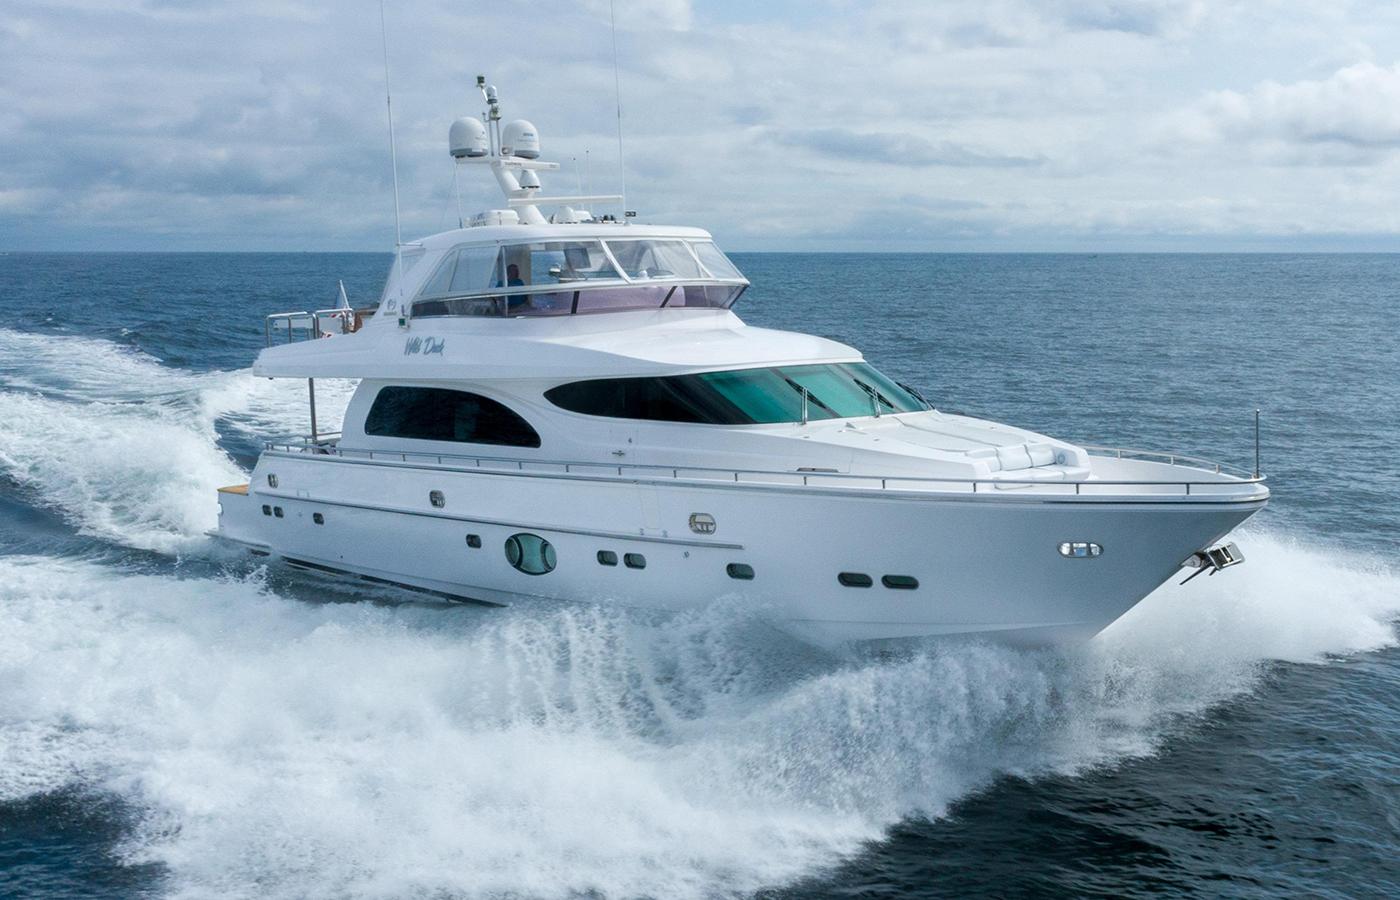 78 Horizon Motor Yacht Highlight [Boat Review + Video]